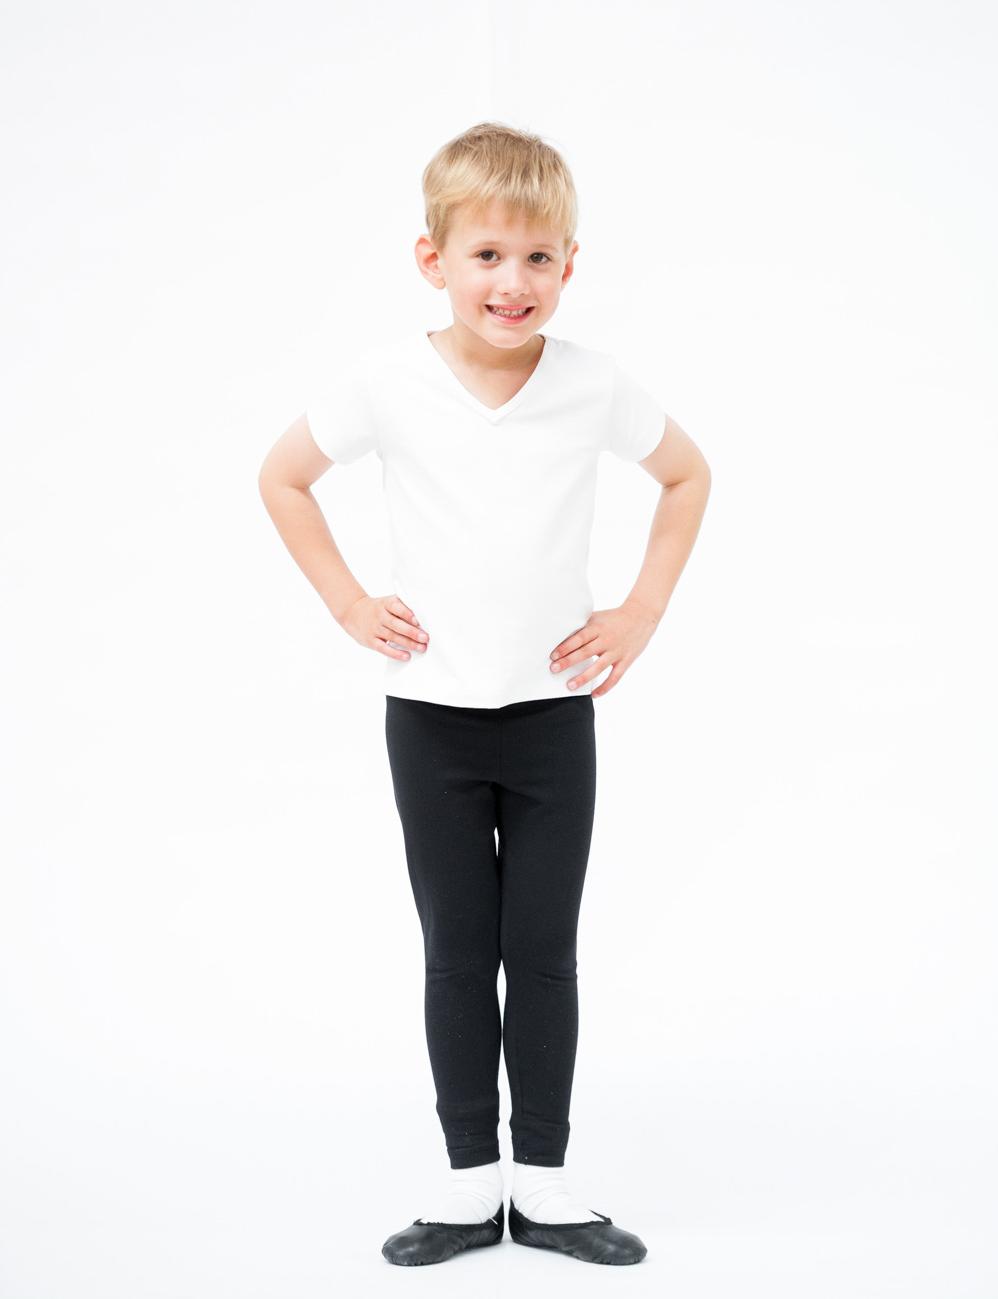 Boys Mathis Dance Studios uniform